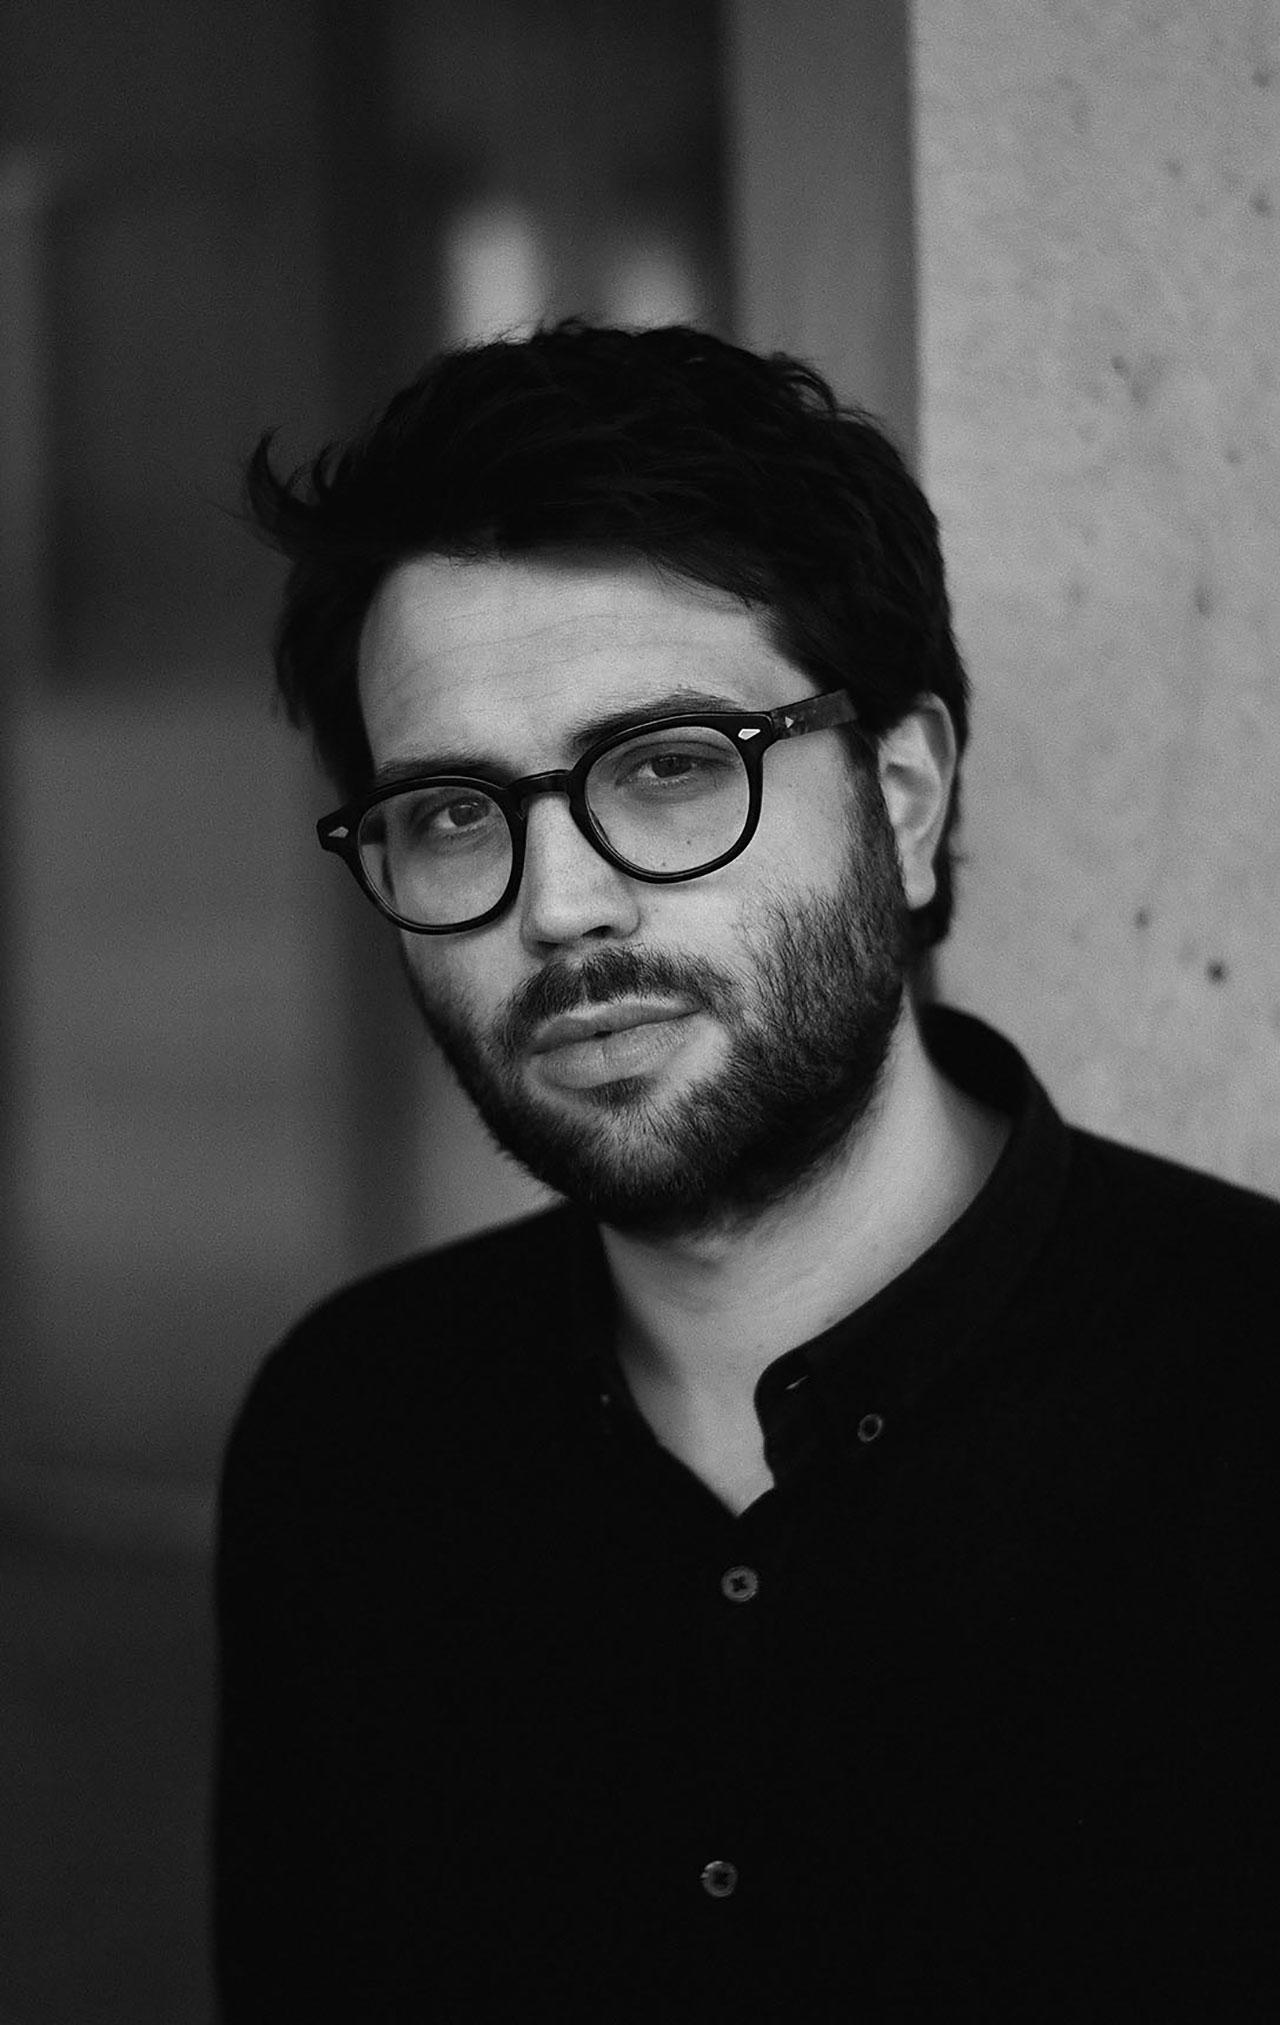 Michel Decar